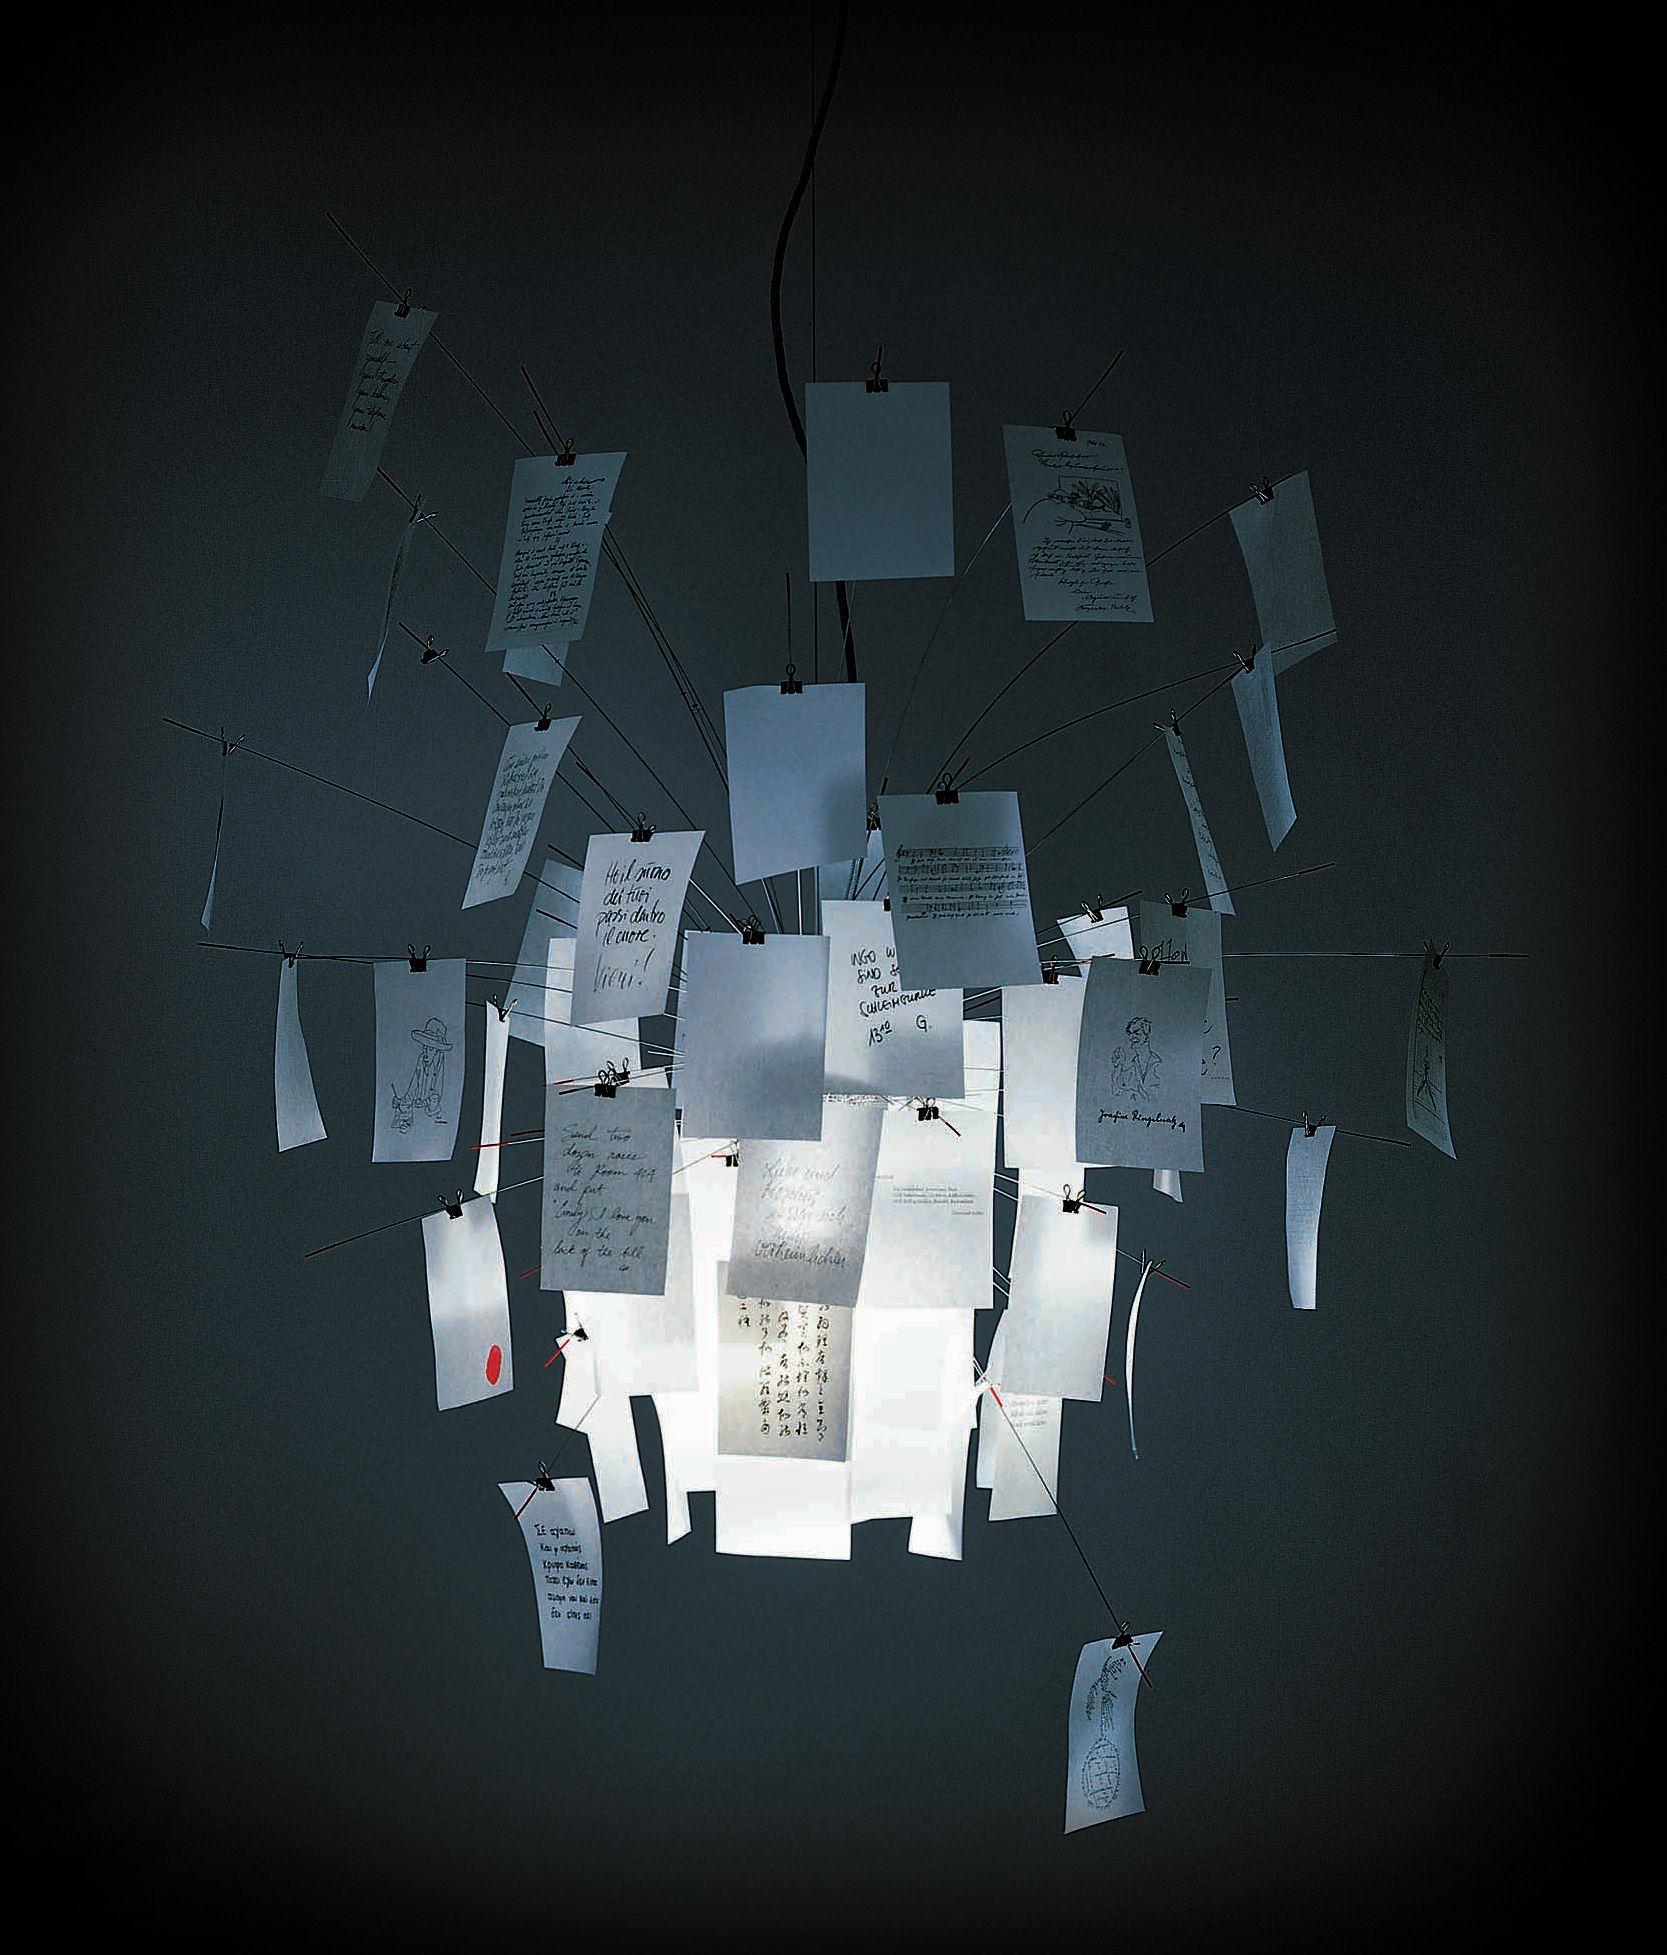 Lighting - Pendant Lighting - Zettel'z 5 Pendant by Ingo Maurer - Steel / White and printed paper - Metal, Paper